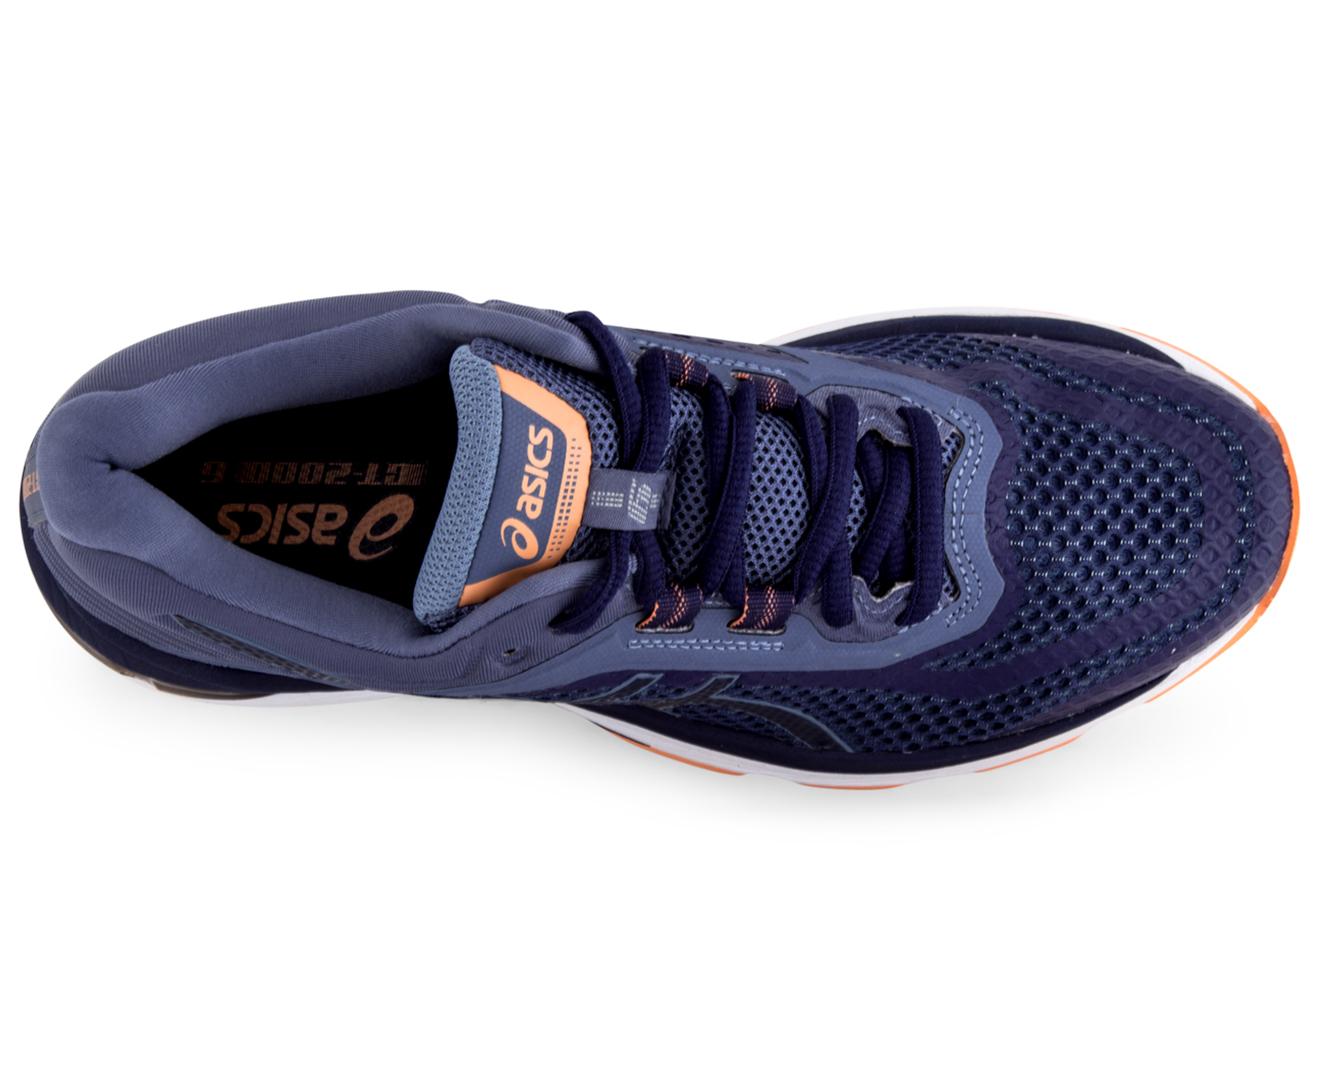 707aa5cea0 ASICS Women's GT-2000 6 Shoe - Indigo Blue/Indigo Blue/Smoke Blue